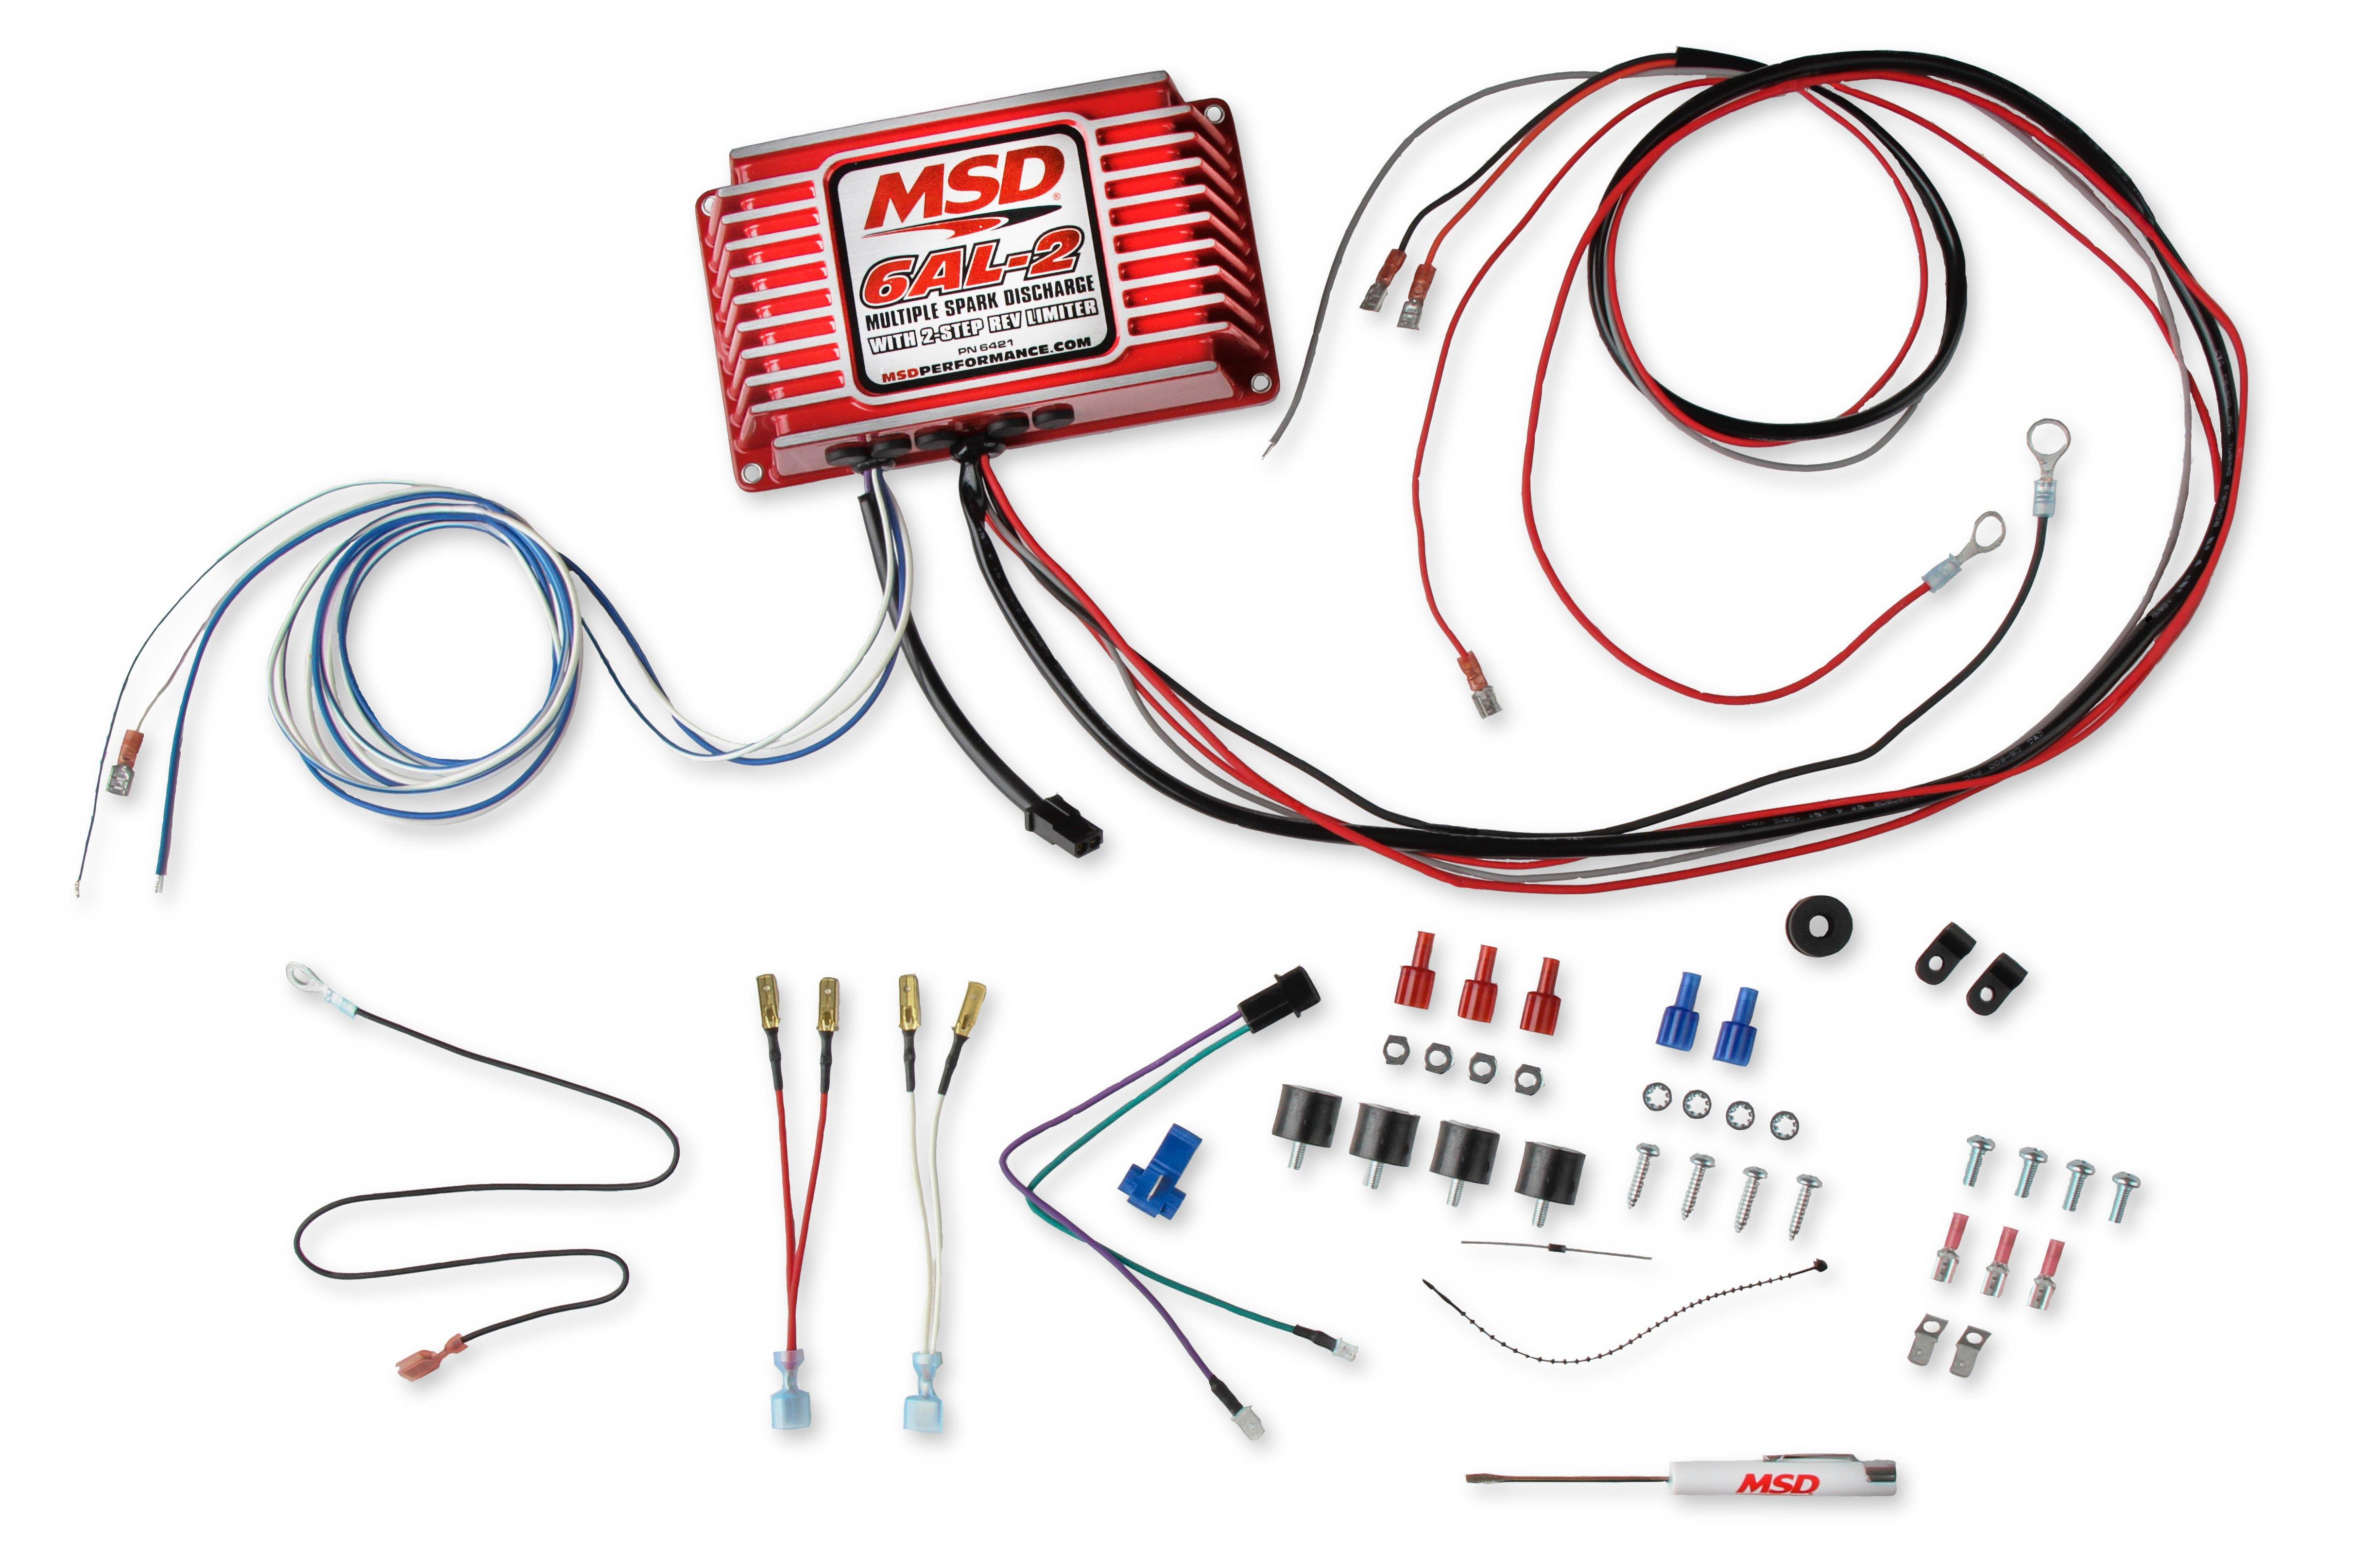 MSD 6421 MSD 6AL-2 Ignition ControlHolley